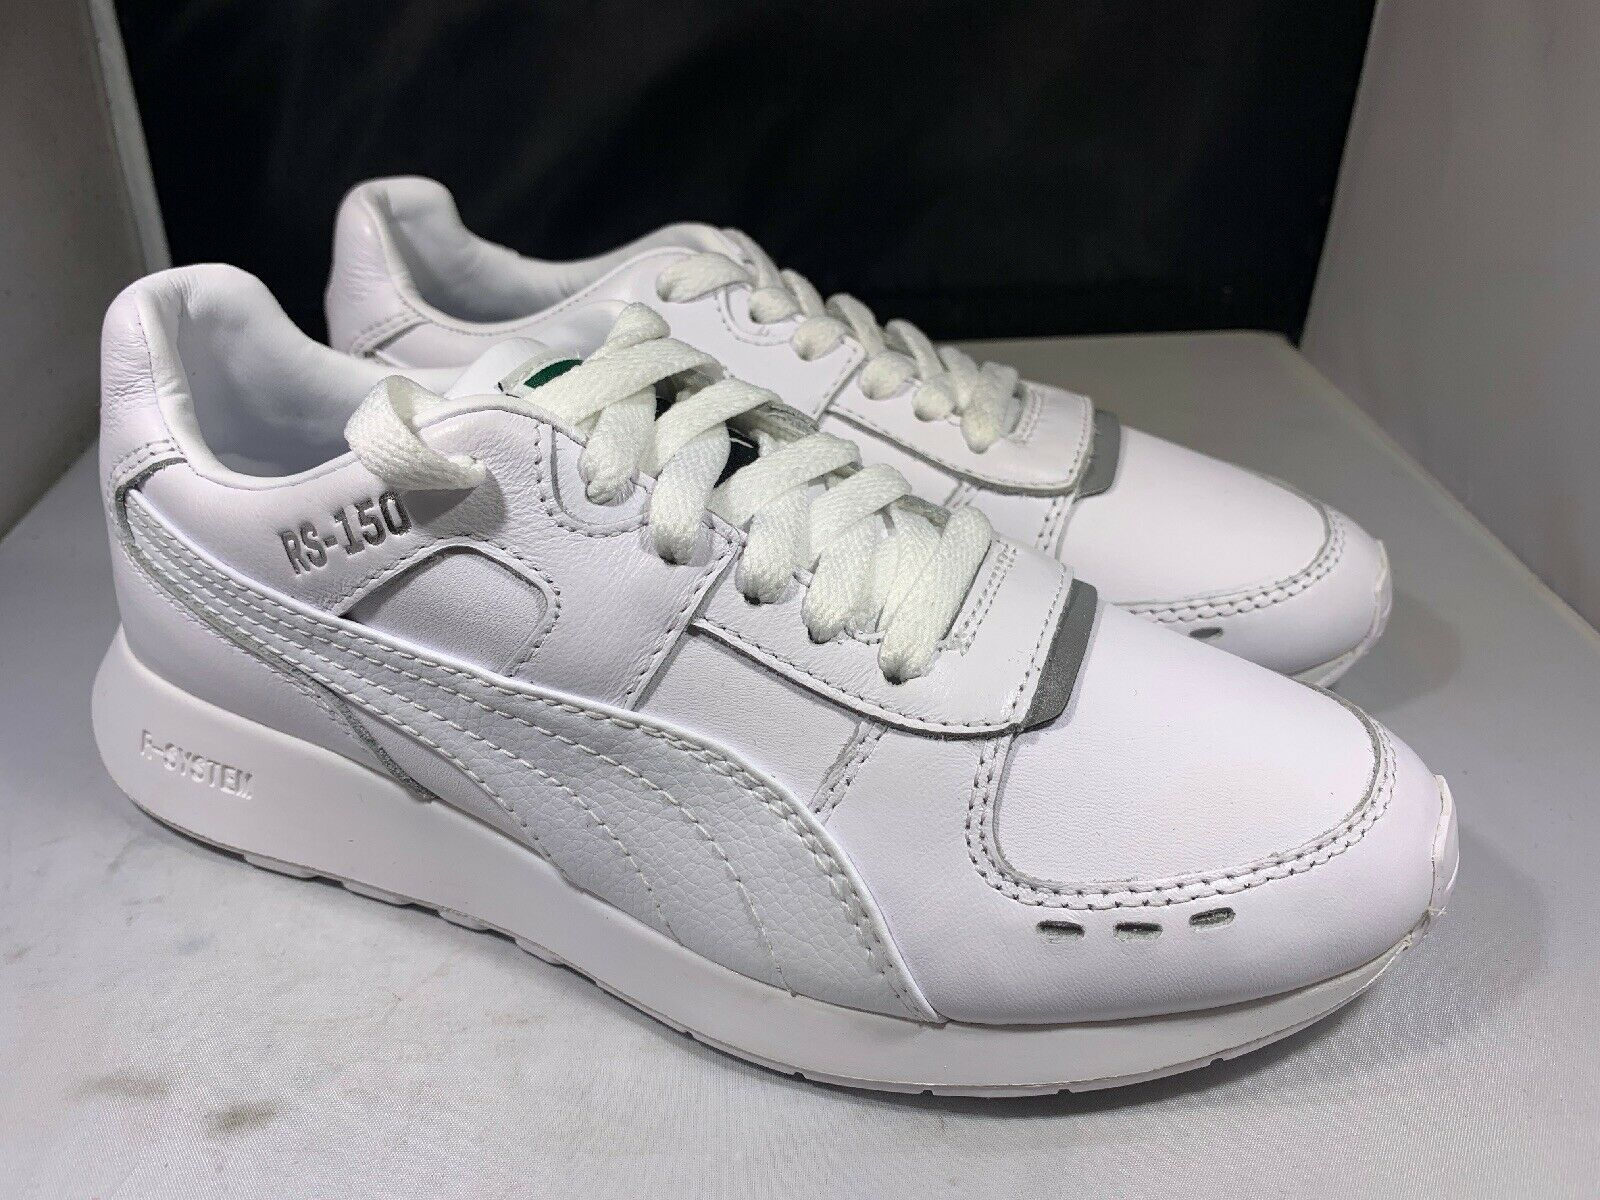 Puma RS-150 White Women's Size 7  36945401 ( H23)